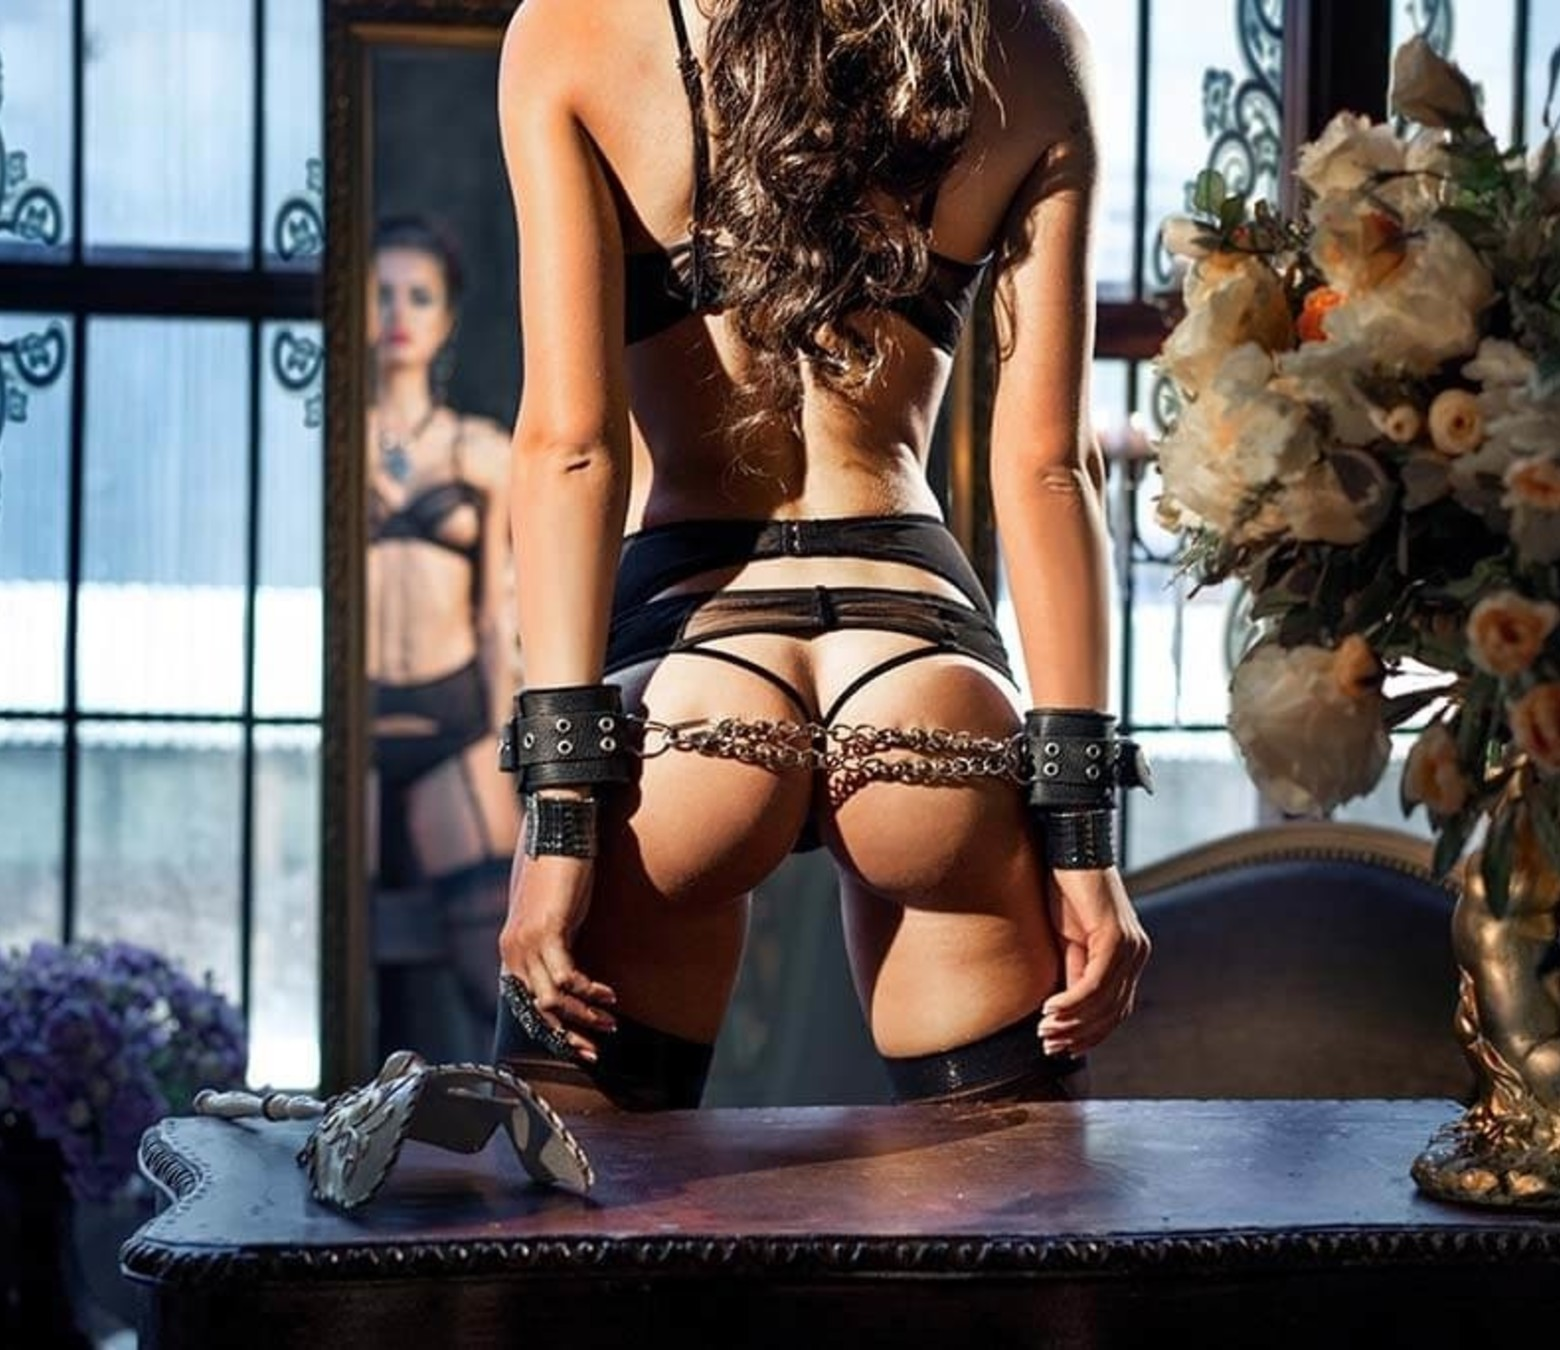 Tied Up foto-art plexiglas